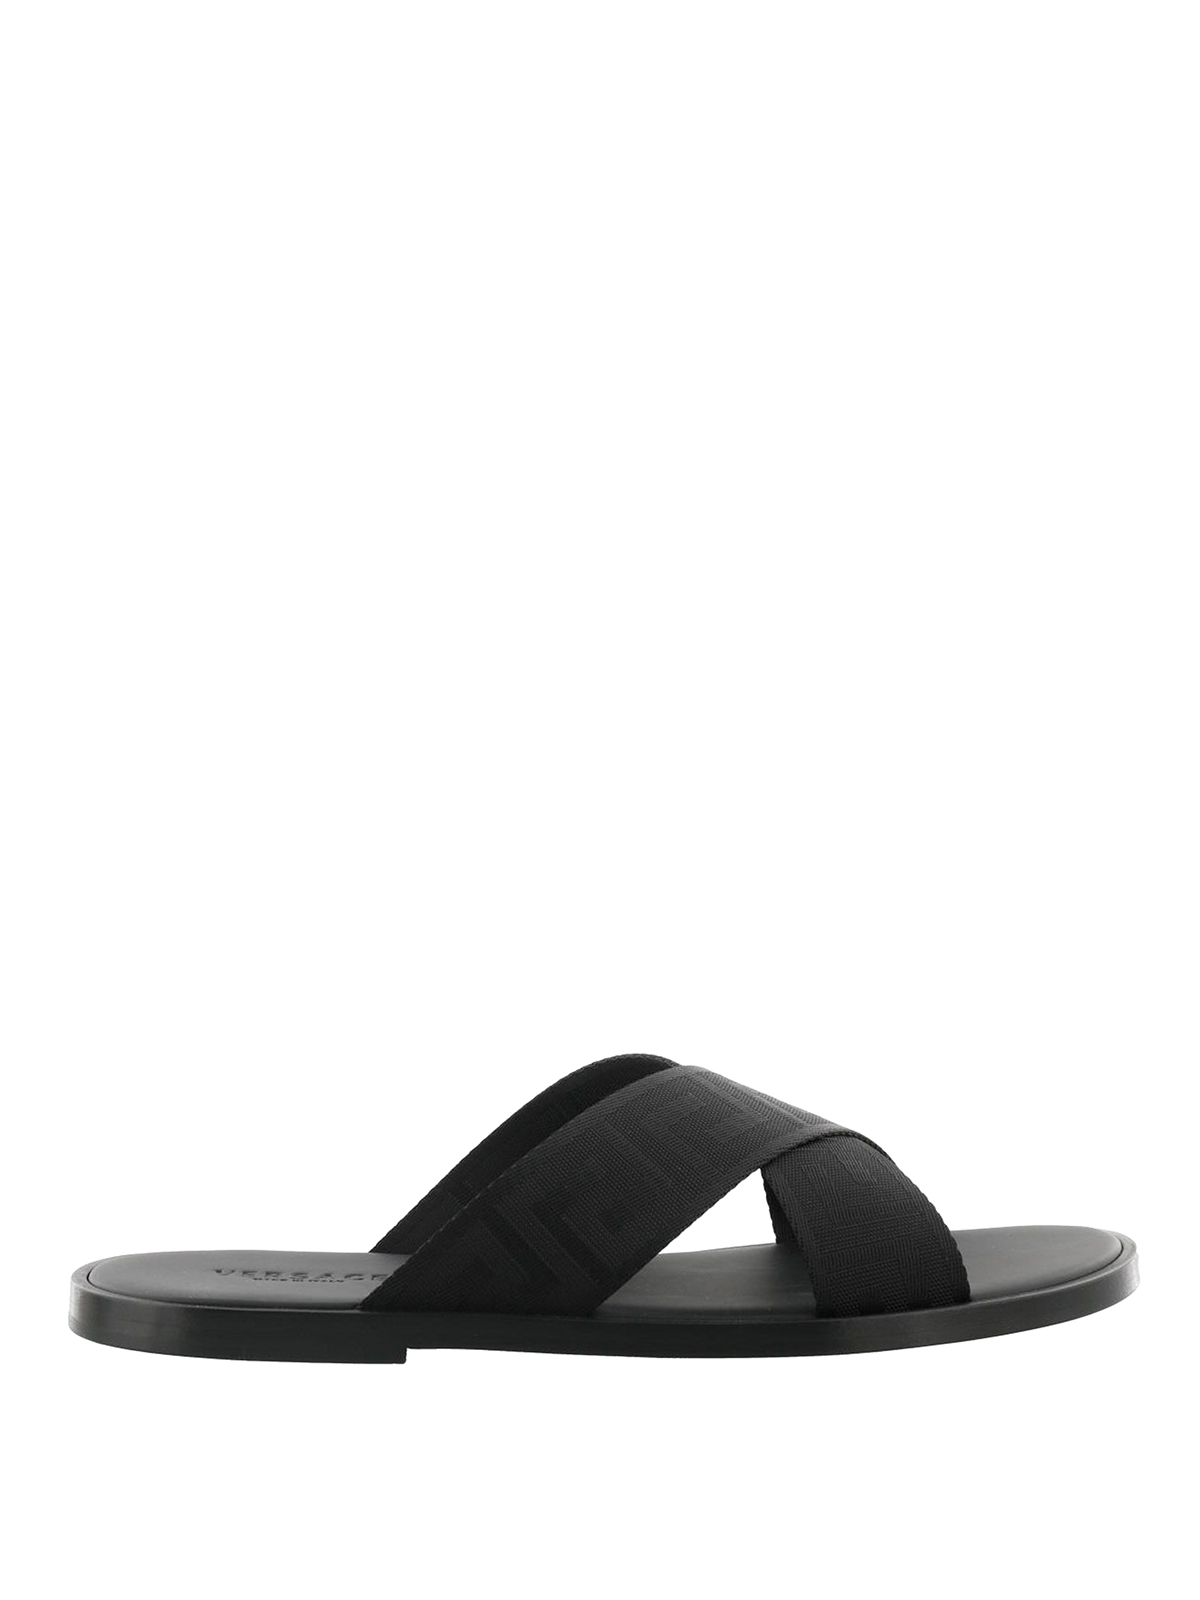 Versace - Greca Key slide sandals